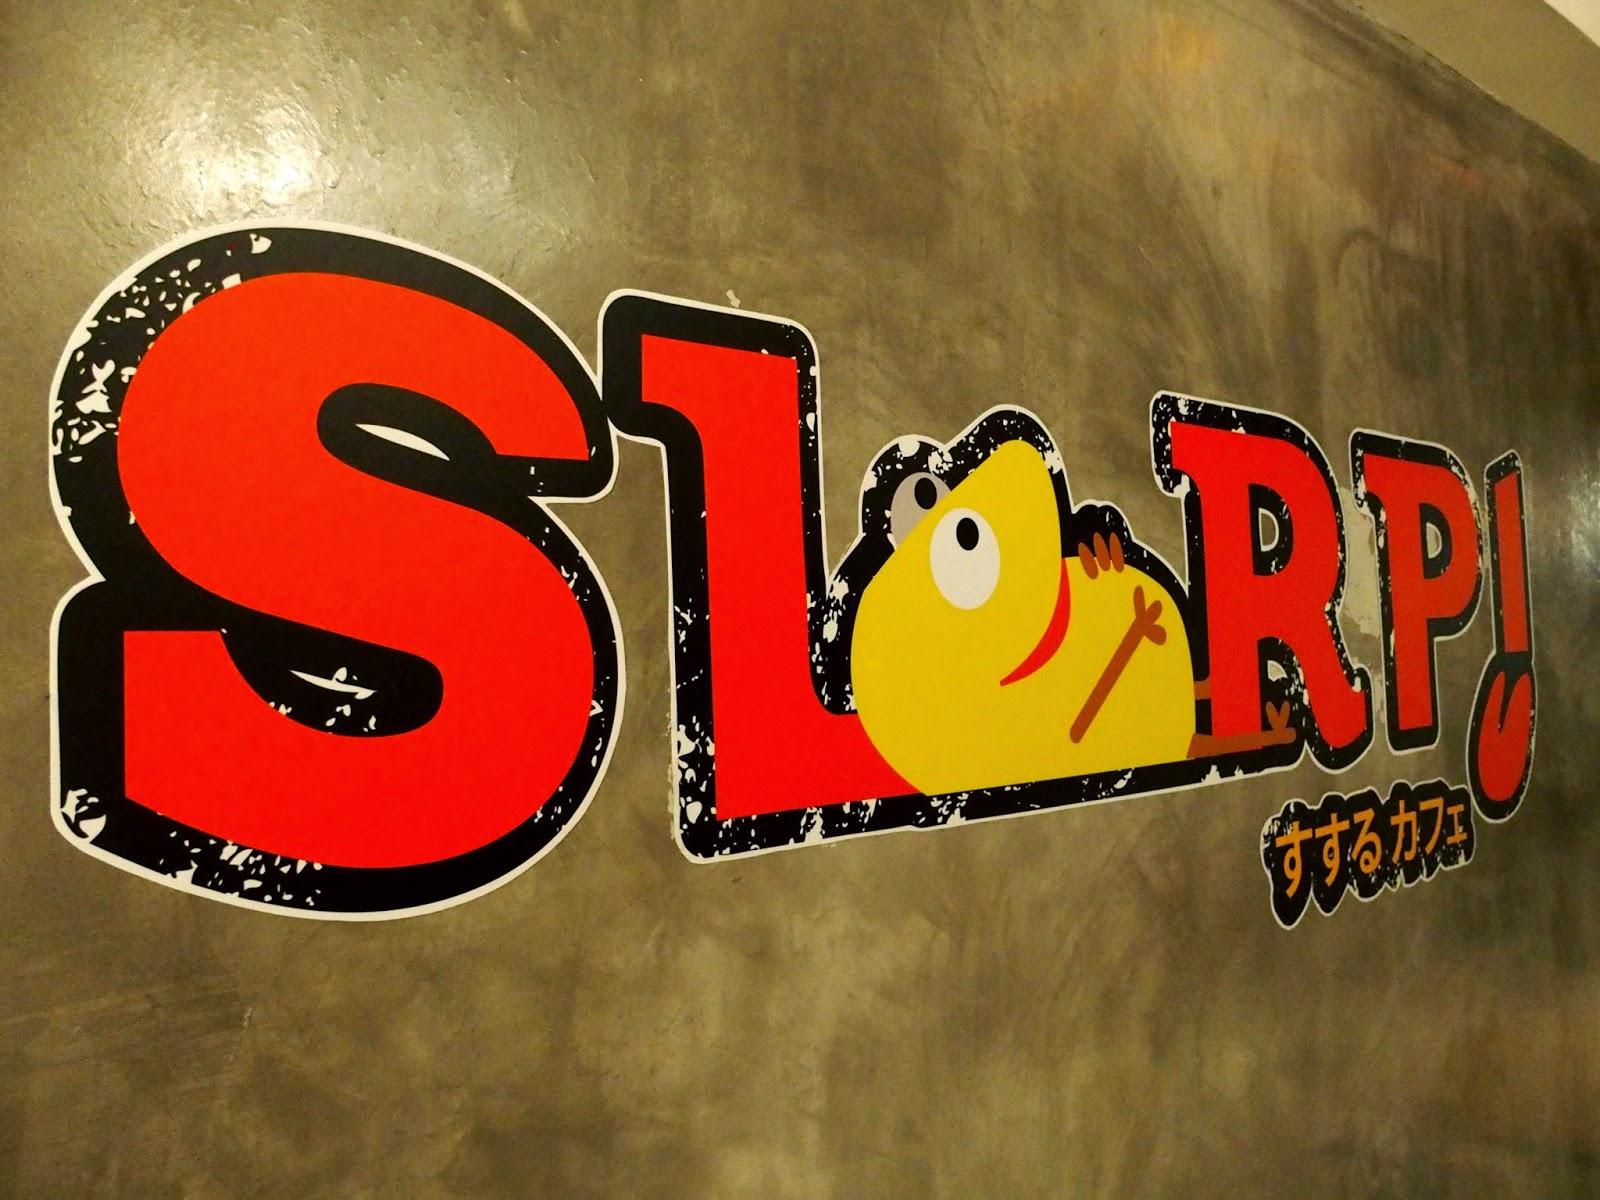 Follow Me To Eat La - Malaysian Food Blog: Slurp Cafe @ 3 Two Square